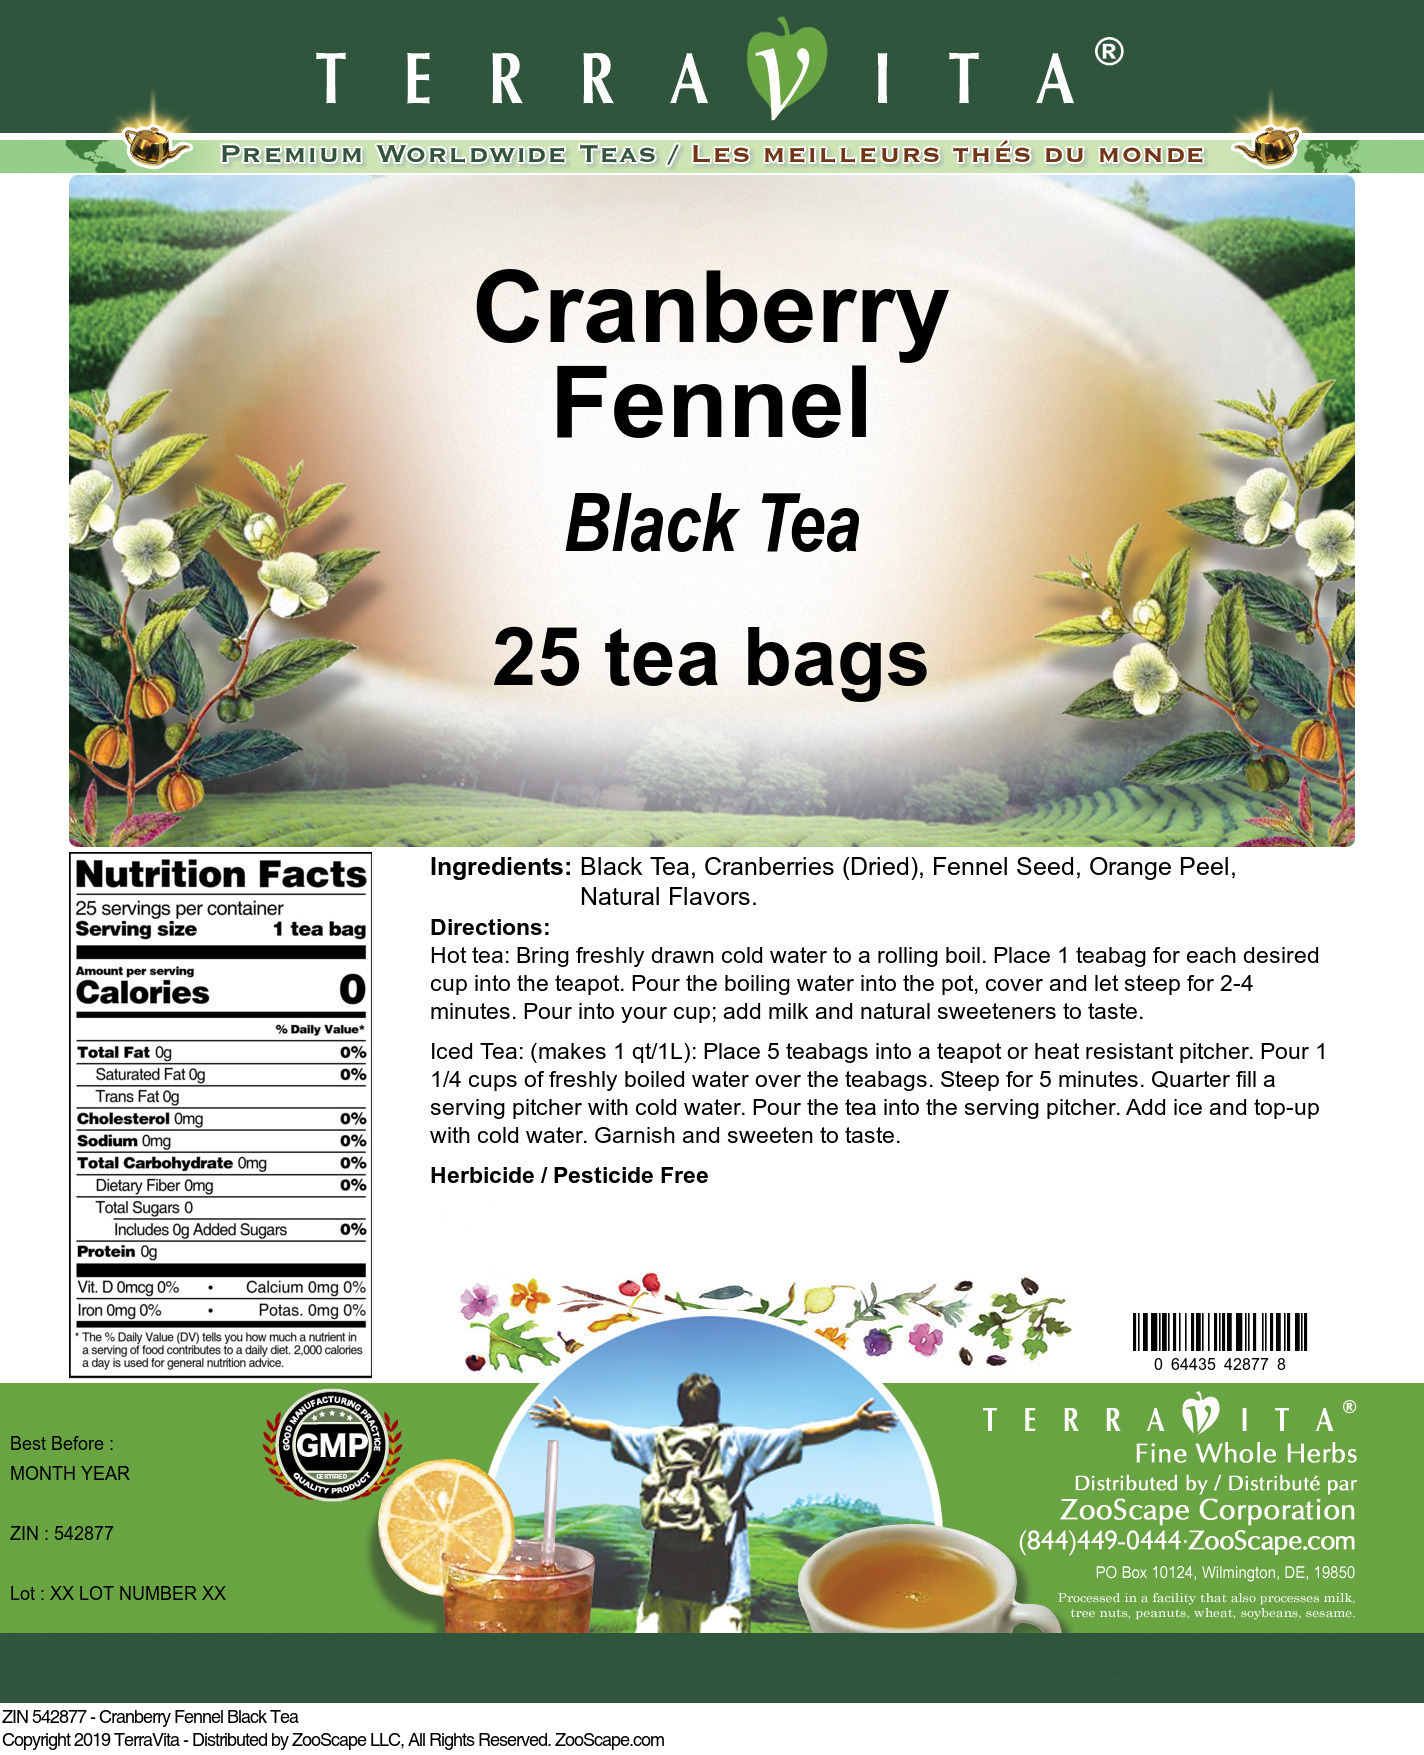 Cranberry Fennel Black Tea